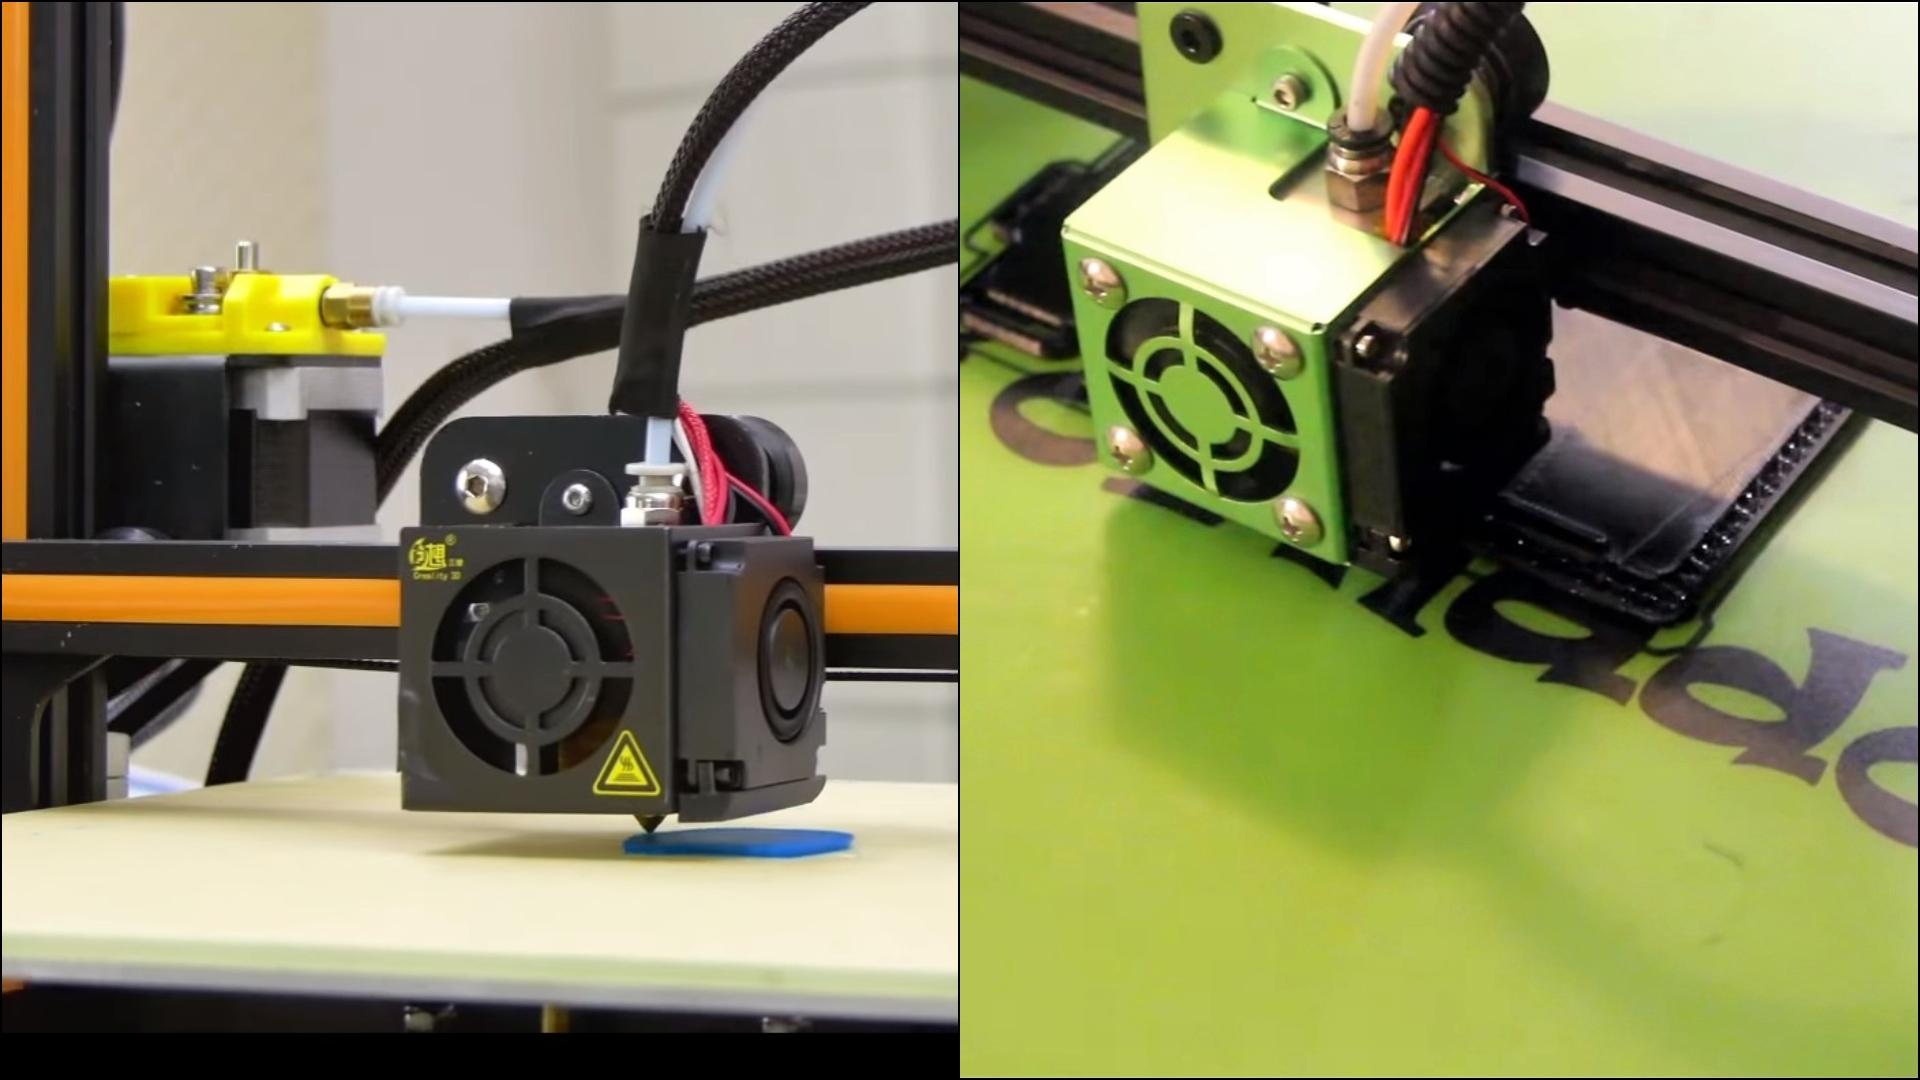 Tevo Tornado vs Creality CR-10 – 3D Printer Shootout | All3DP